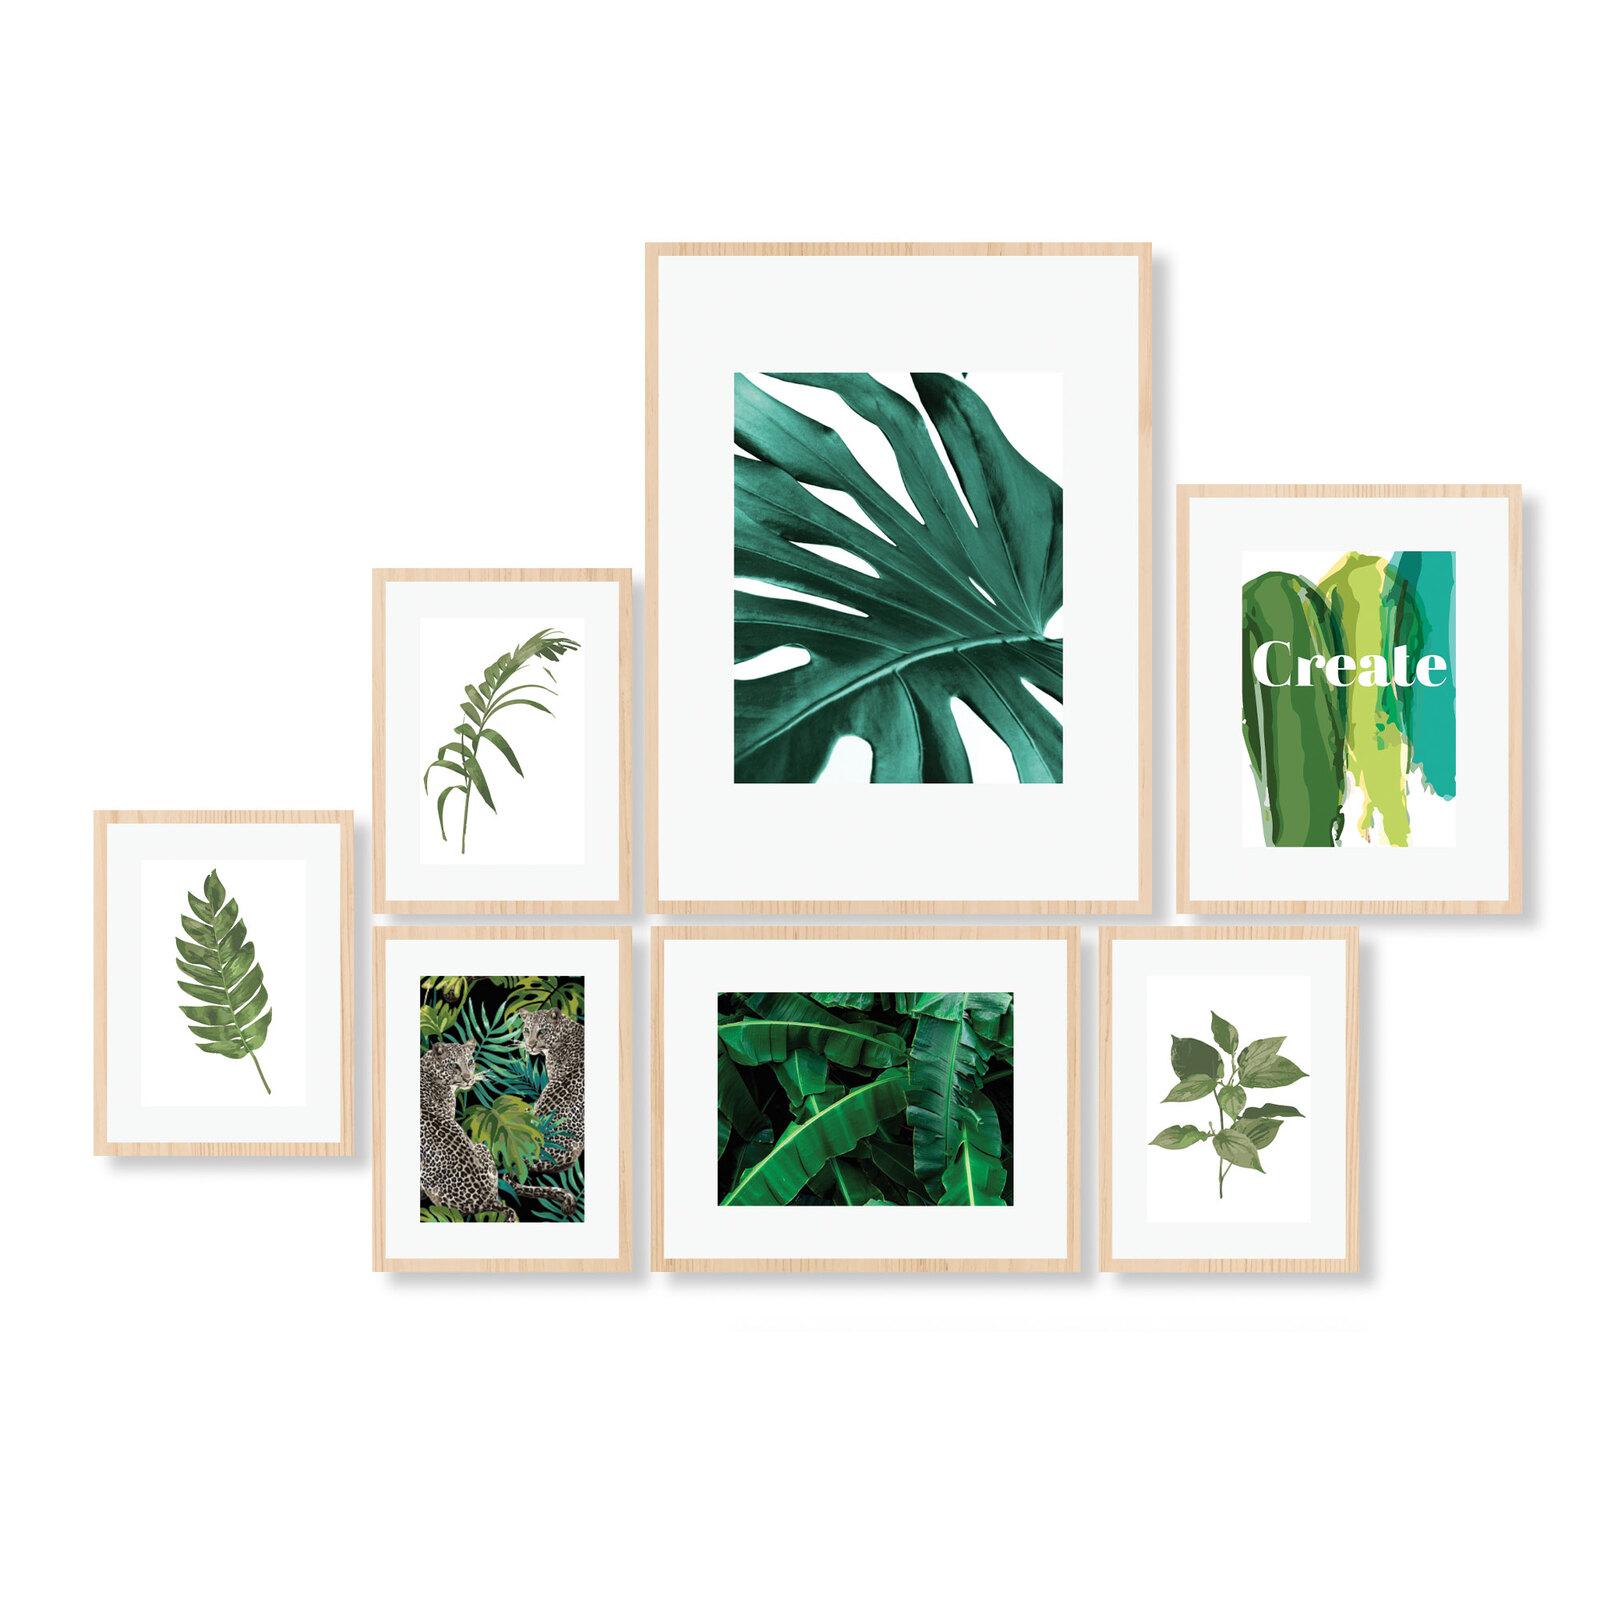 Cooper & Co. Instant Gallery Wall 7 Piece Frame Set Oak